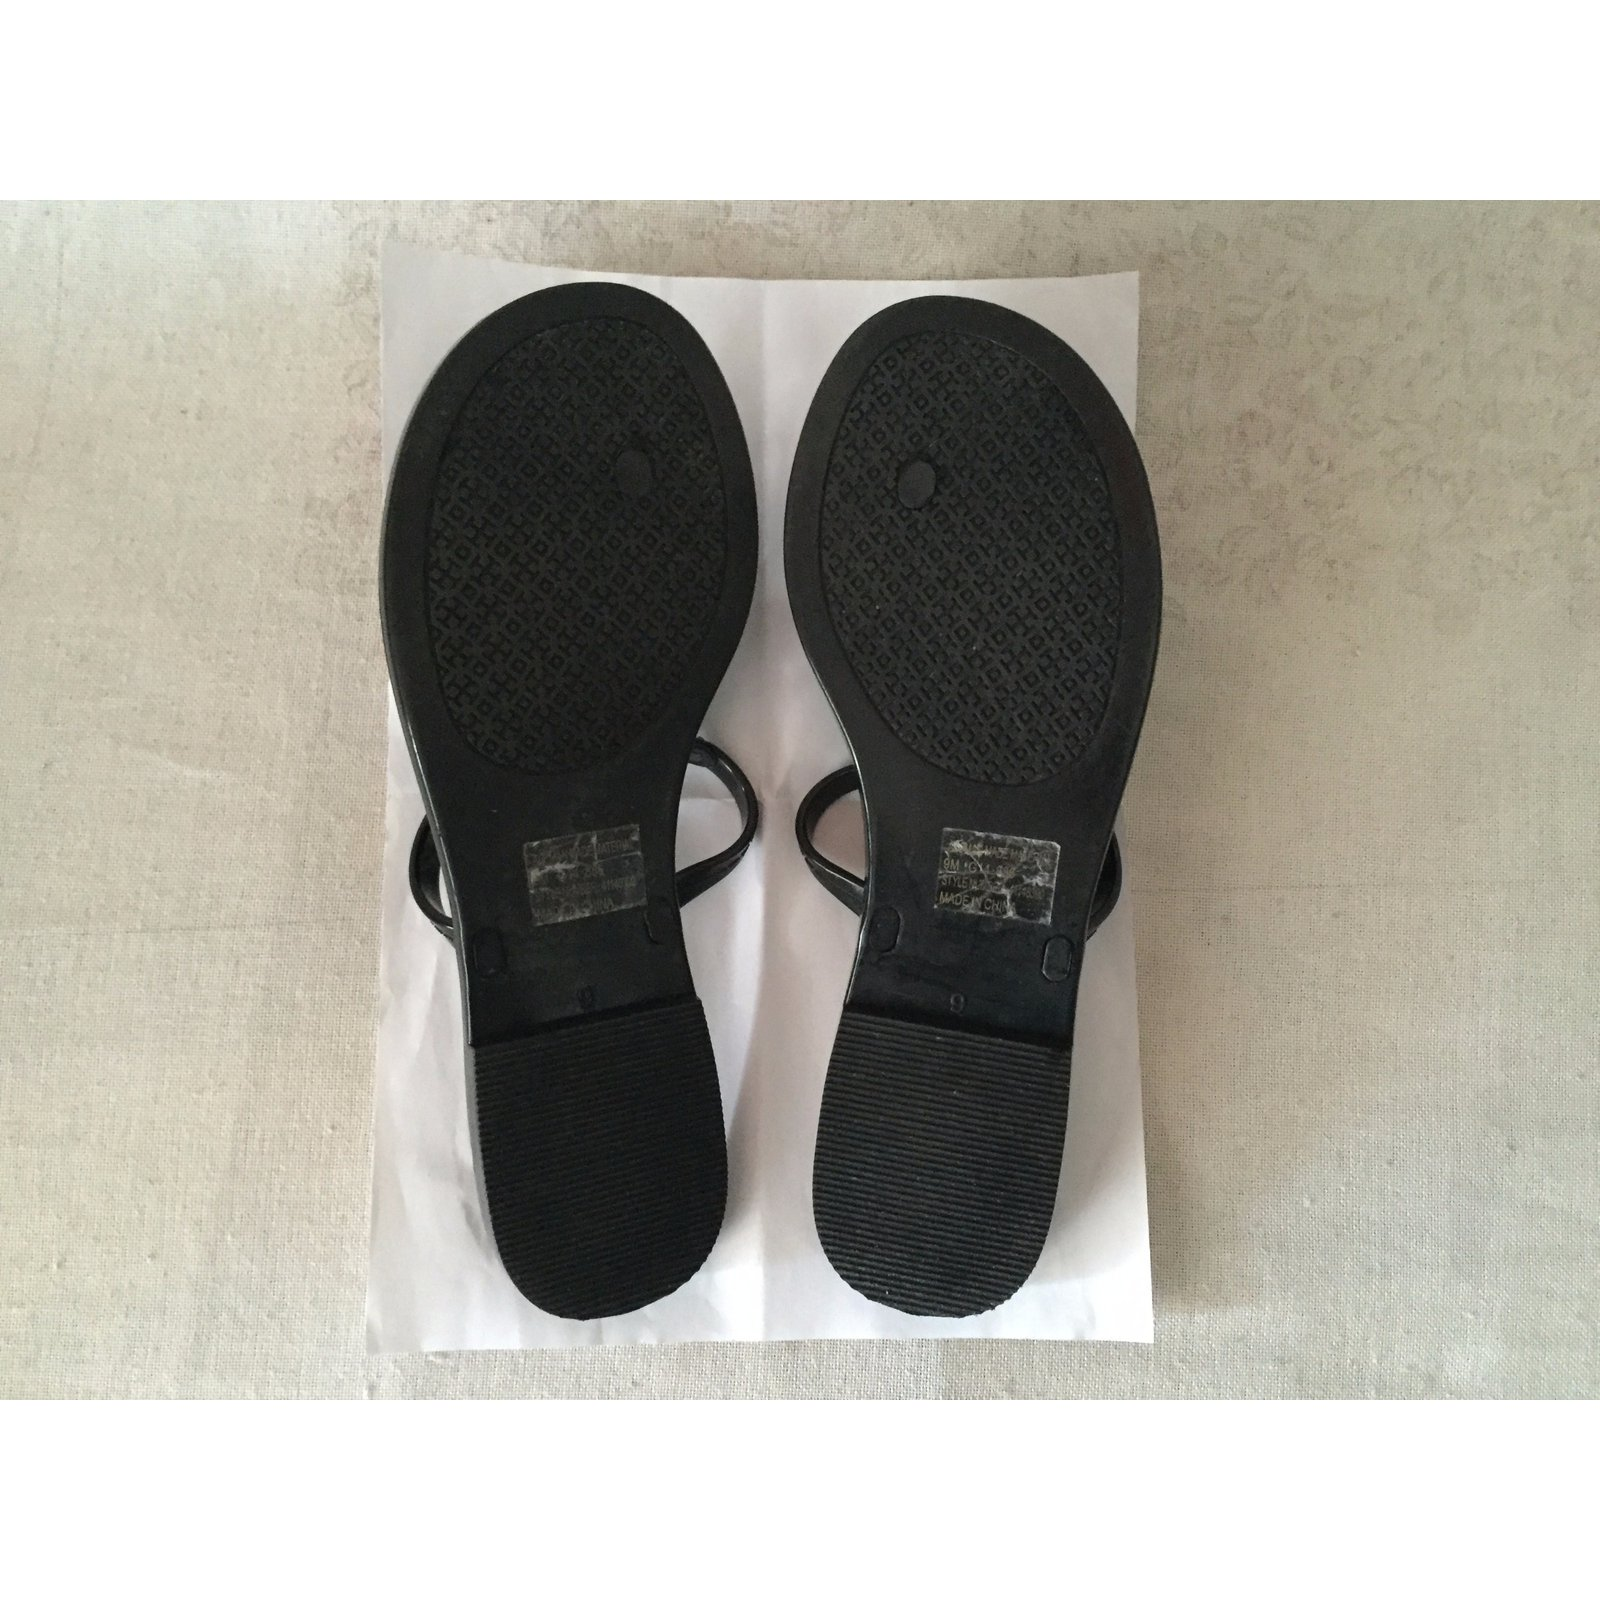 7c89e27e283 Tory Burch Sandals Sandals Plastic Black ref.34336 - Joli Closet